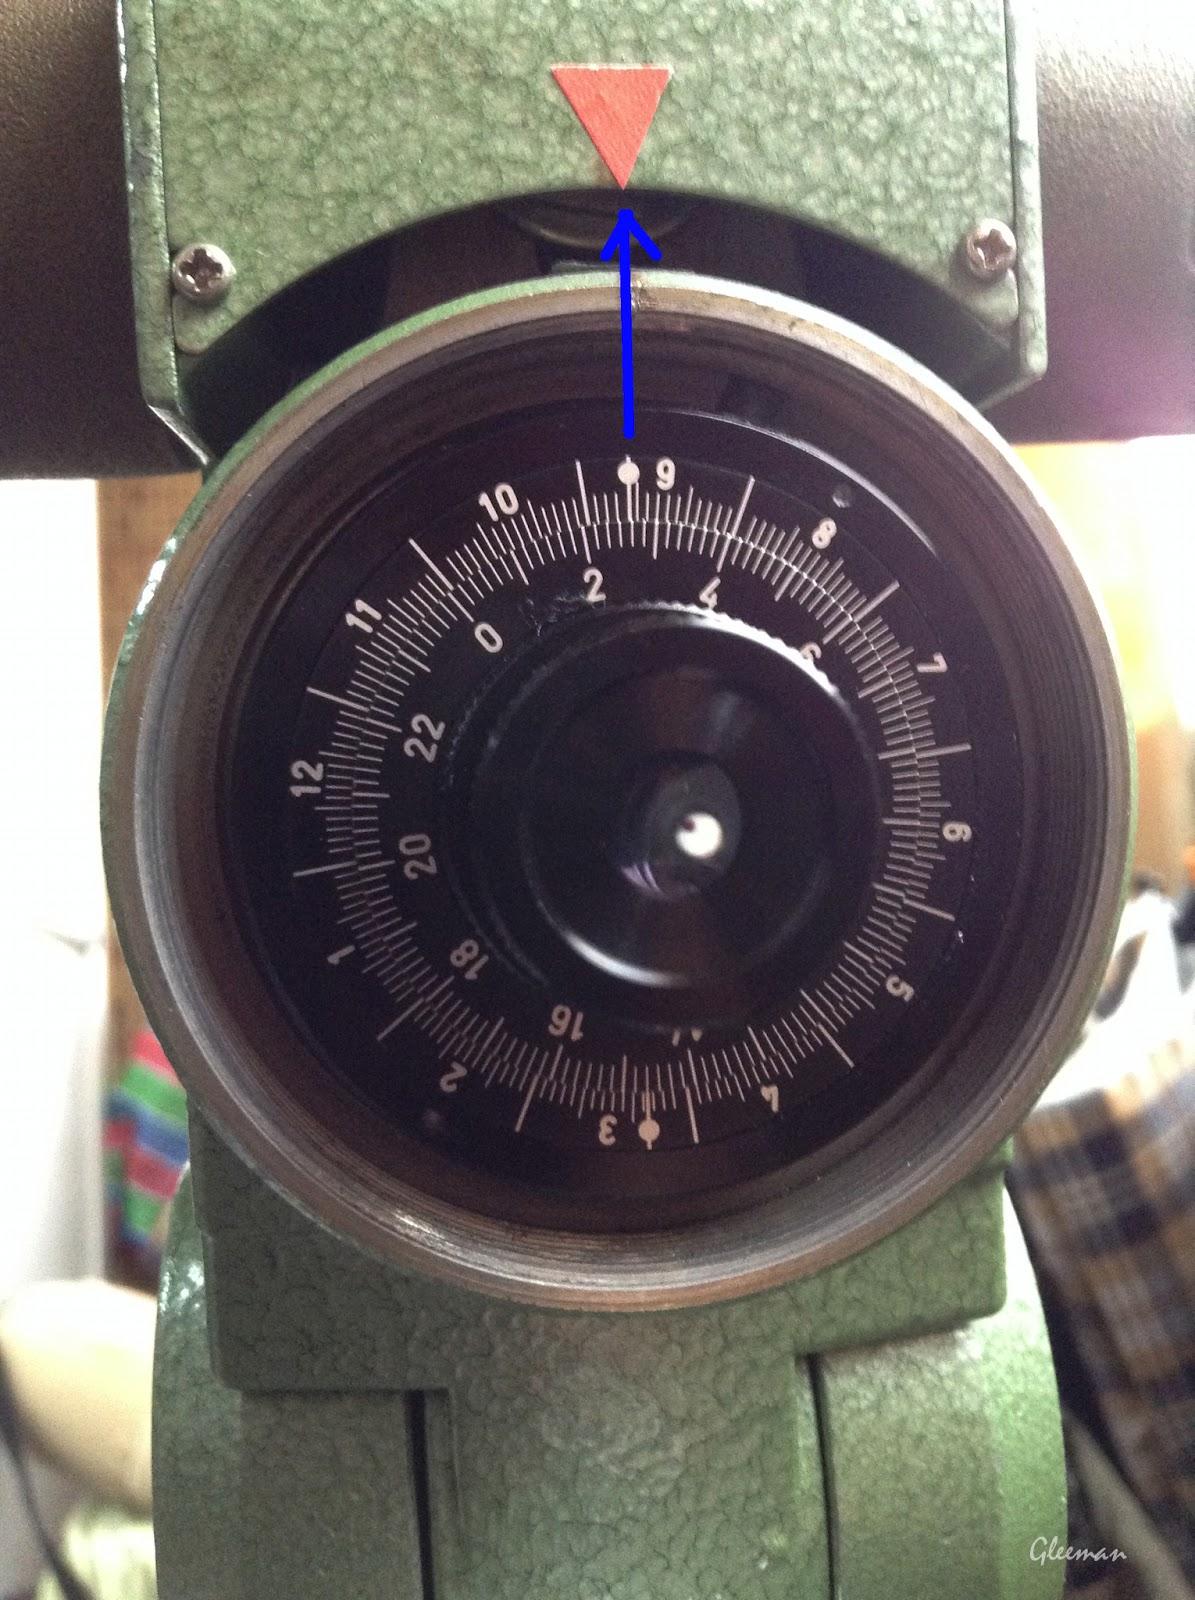 Pentax Ms-3 赤道儀, 在日期環秋分點上的原點記號對準軸體外殼的地方做上新對齊標記,